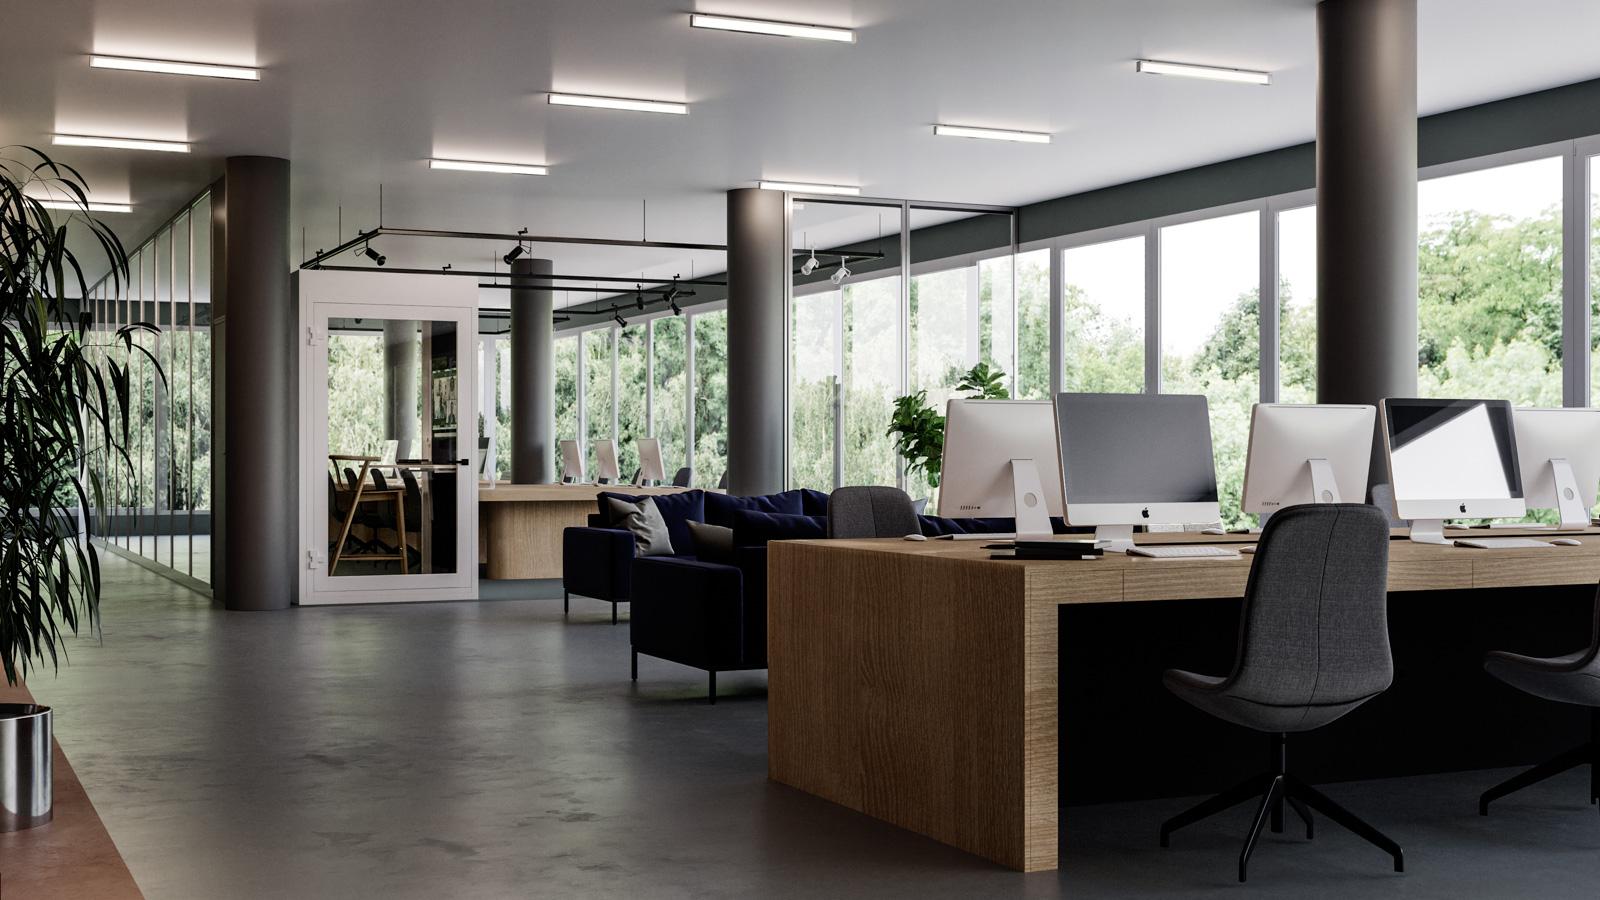 Stillerom sømløst plassert i åpent kontorlandskap